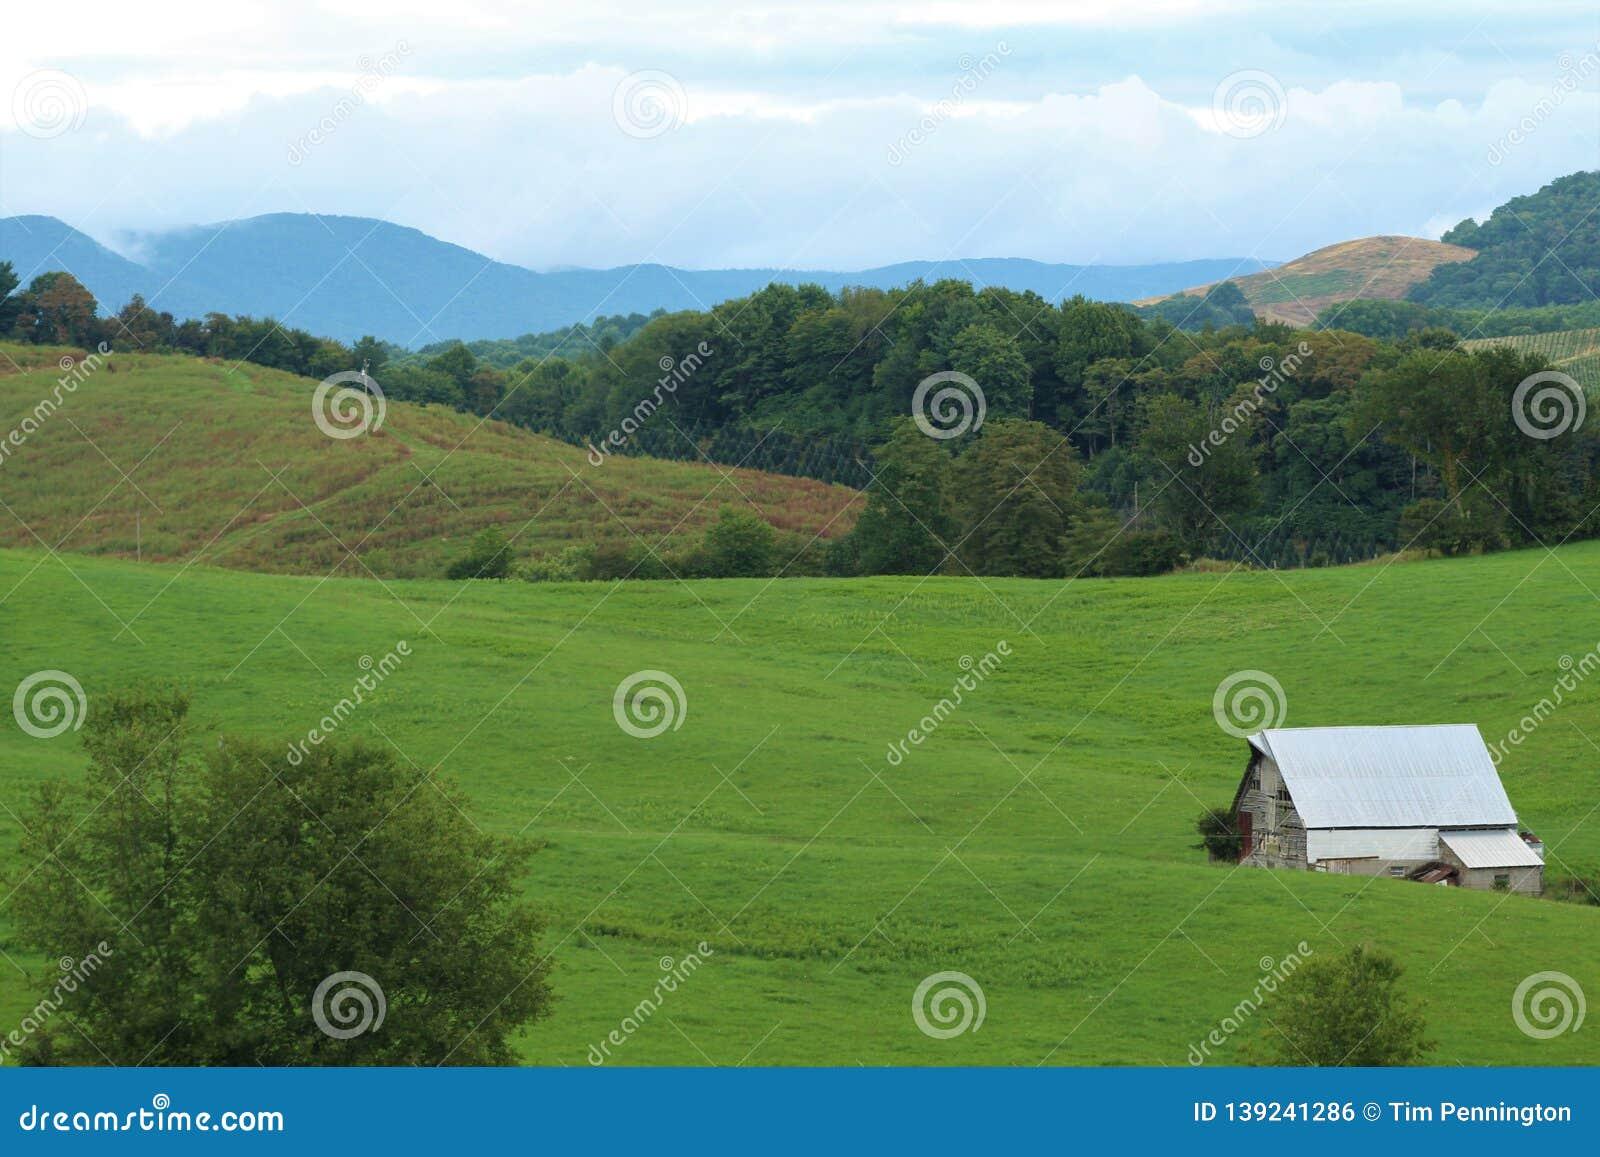 Barn in an Appalachian mountain field